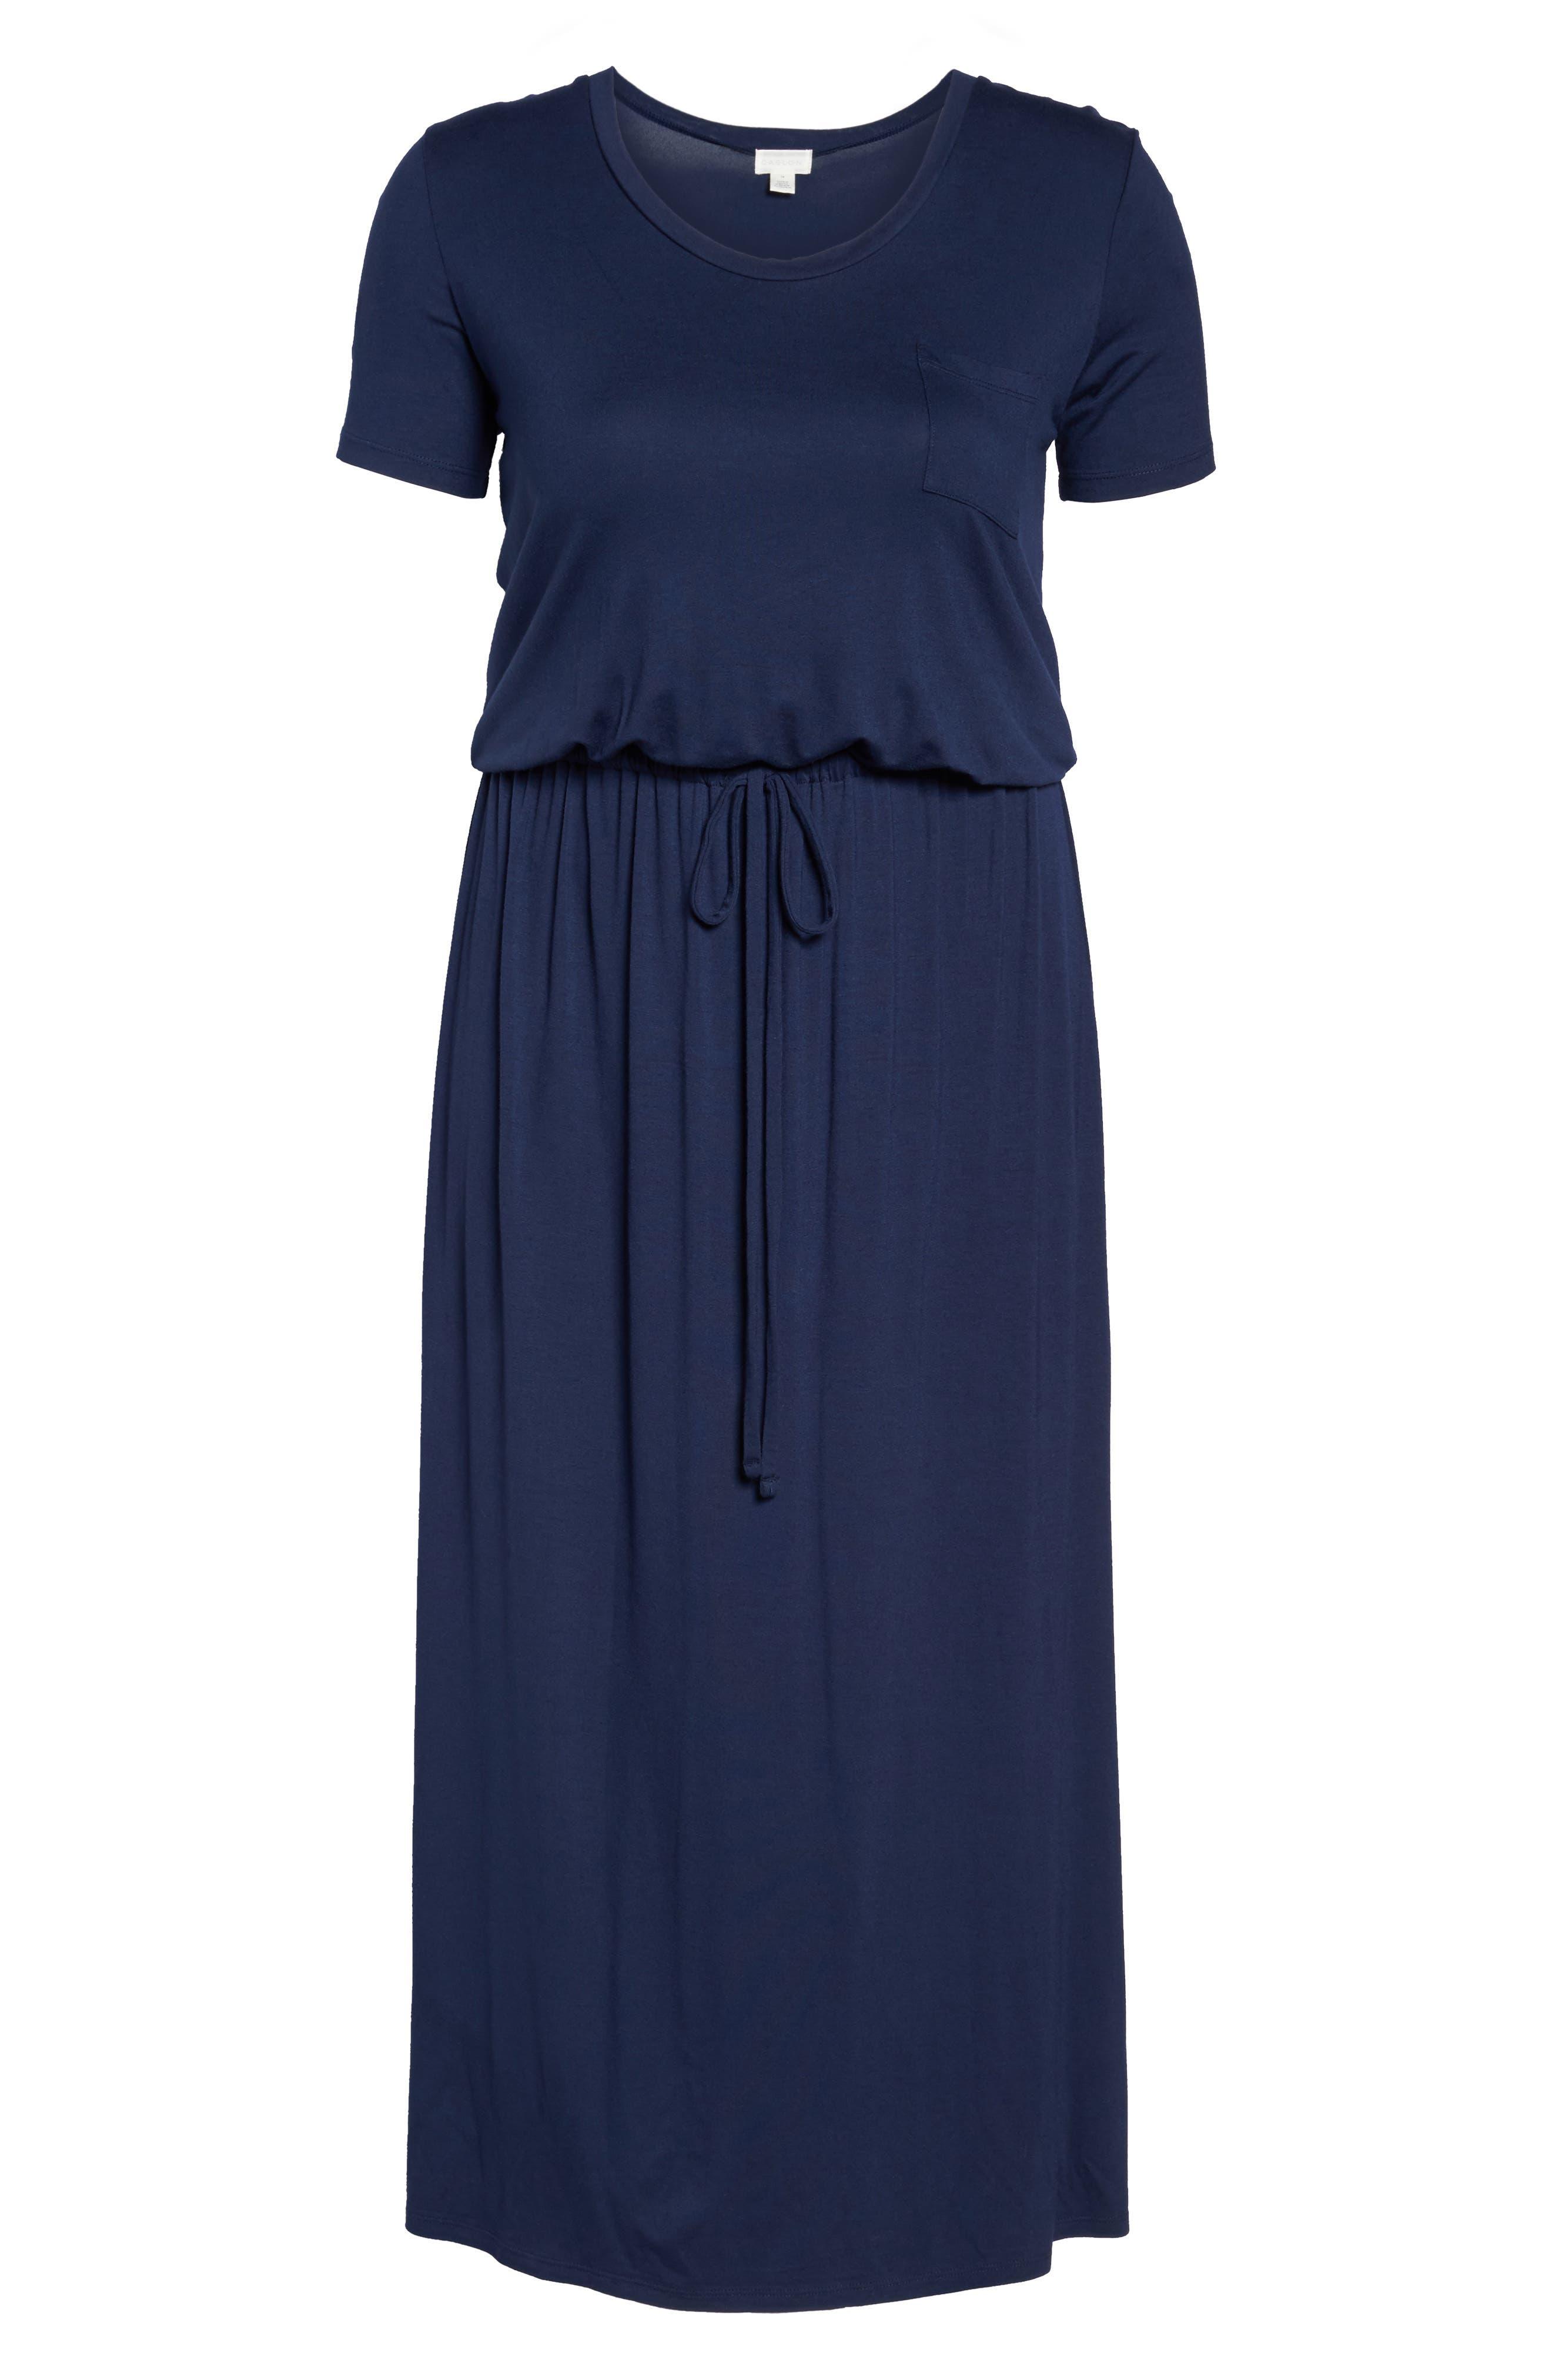 Knit Drawstring Waist Maxi Dress,                             Alternate thumbnail 7, color,                             Navy Peacoat